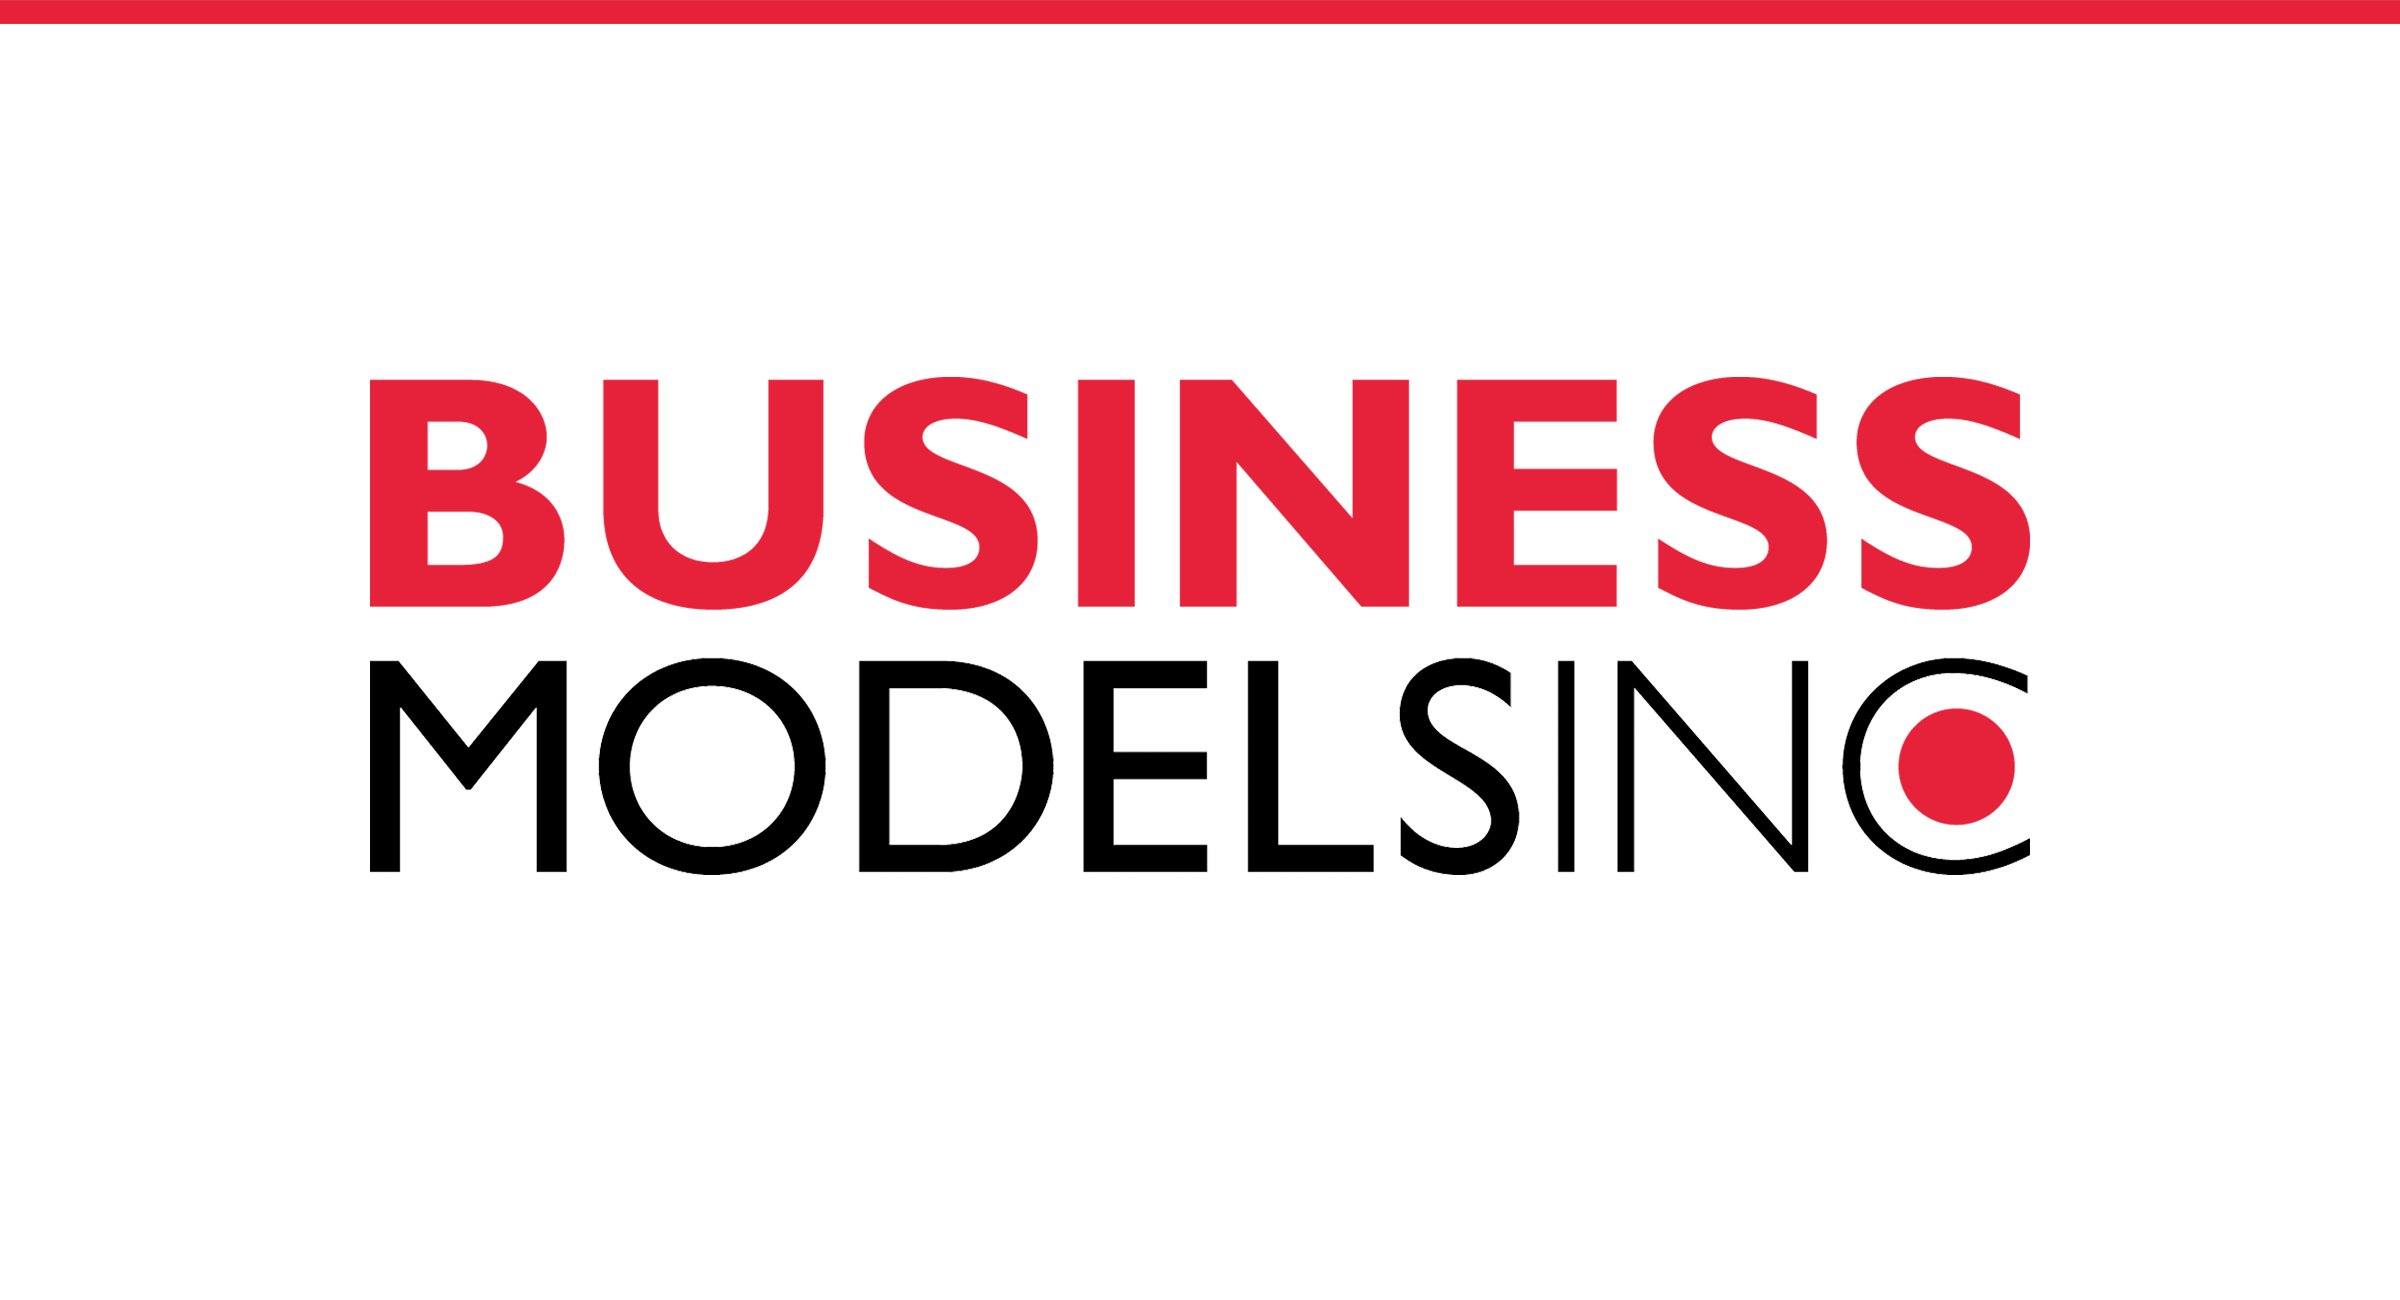 Ebook generation business download model